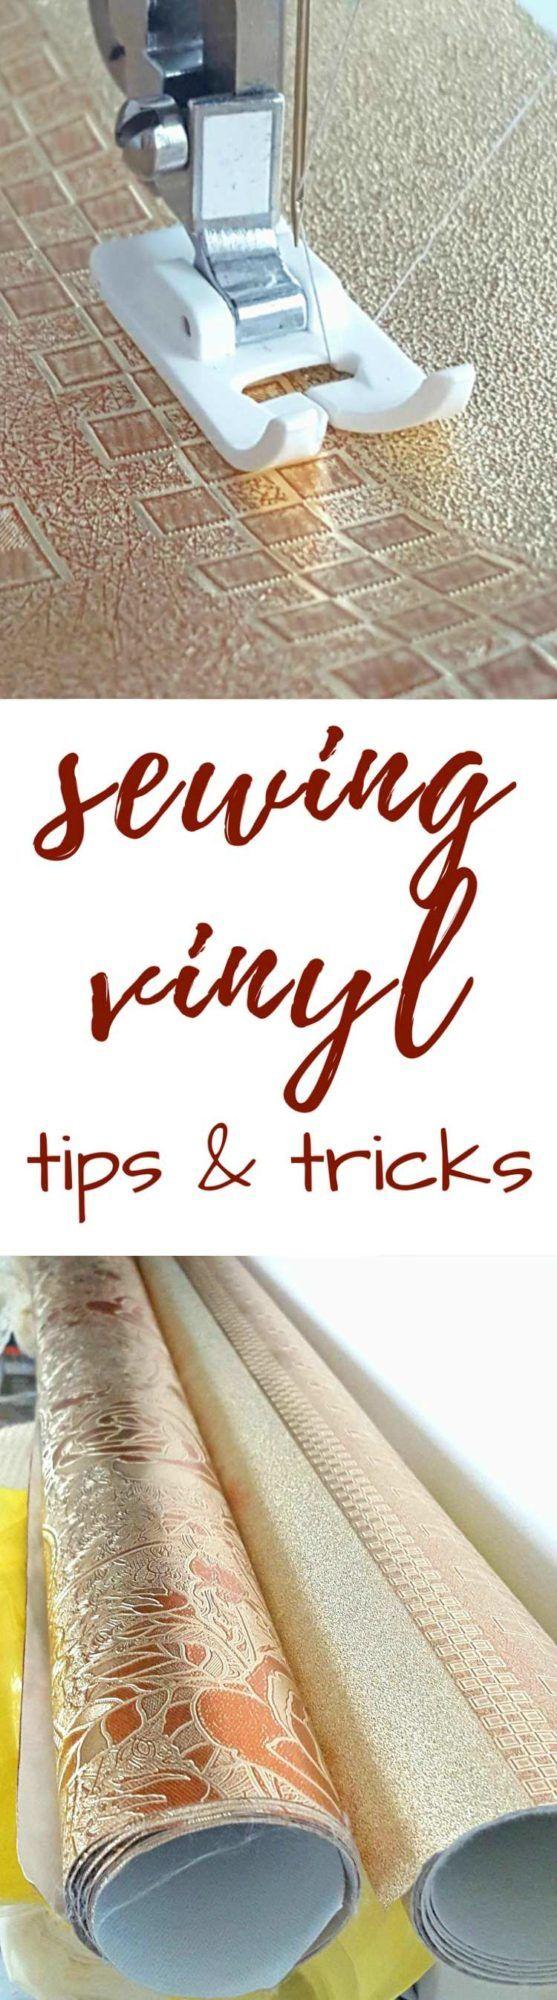 CS - SEWING VINYL TIPS AND TRICKS